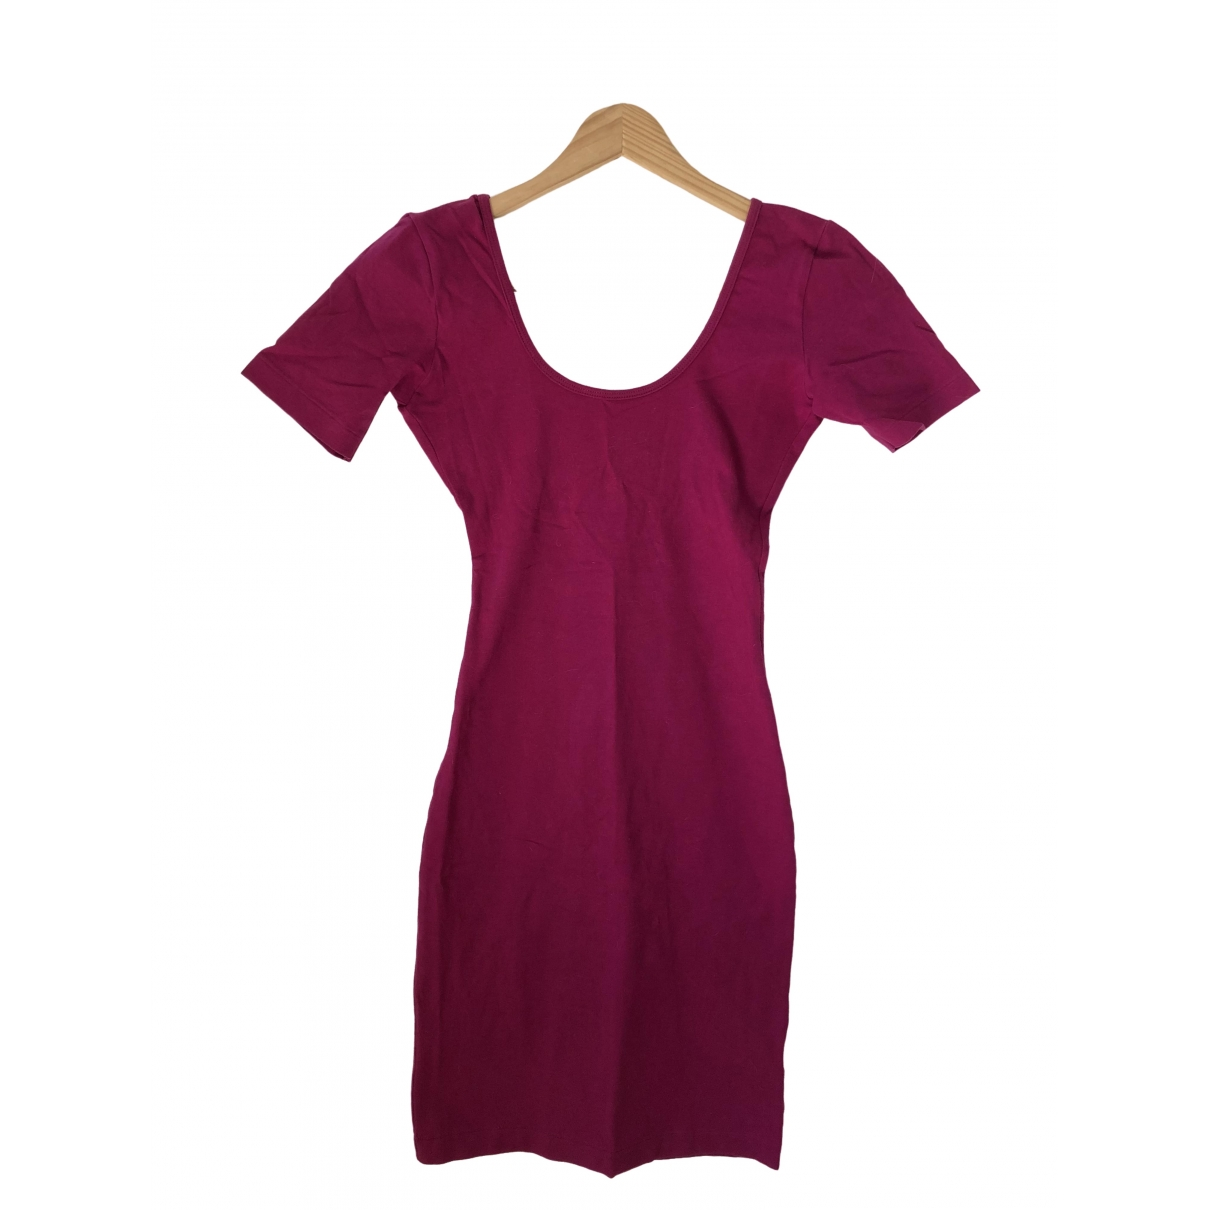 American Apparel - Robe   pour femme en coton - elasthane - rose